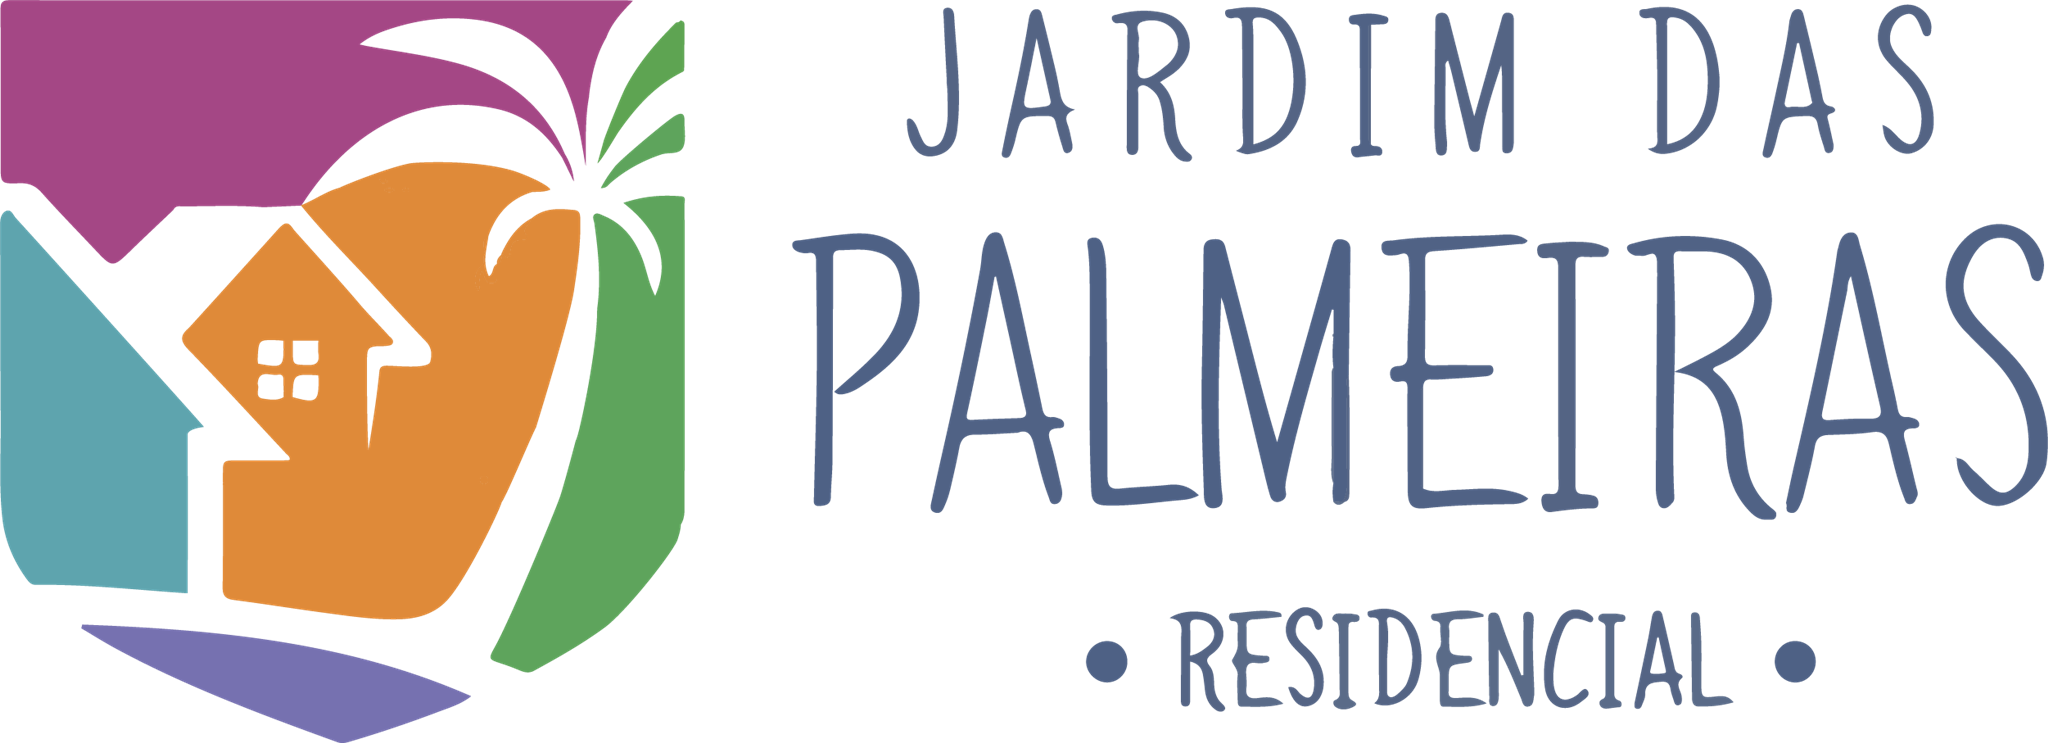 jardim-das-palmeiras-digimobi